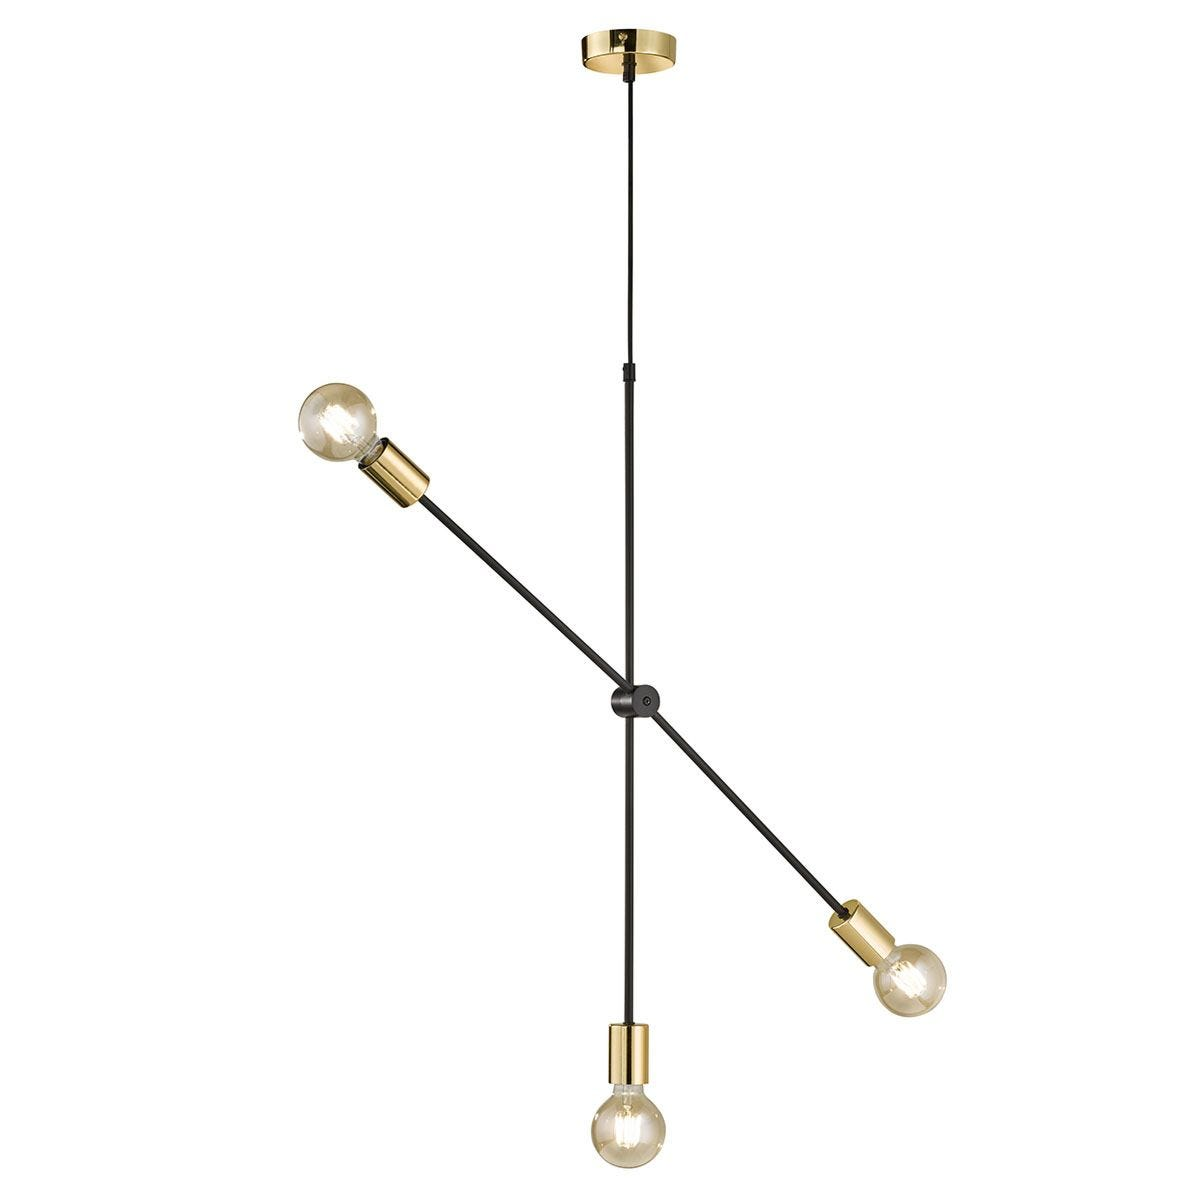 Wofi Sara Pendant 3-Light Ceiling Lamp- Black & Gold